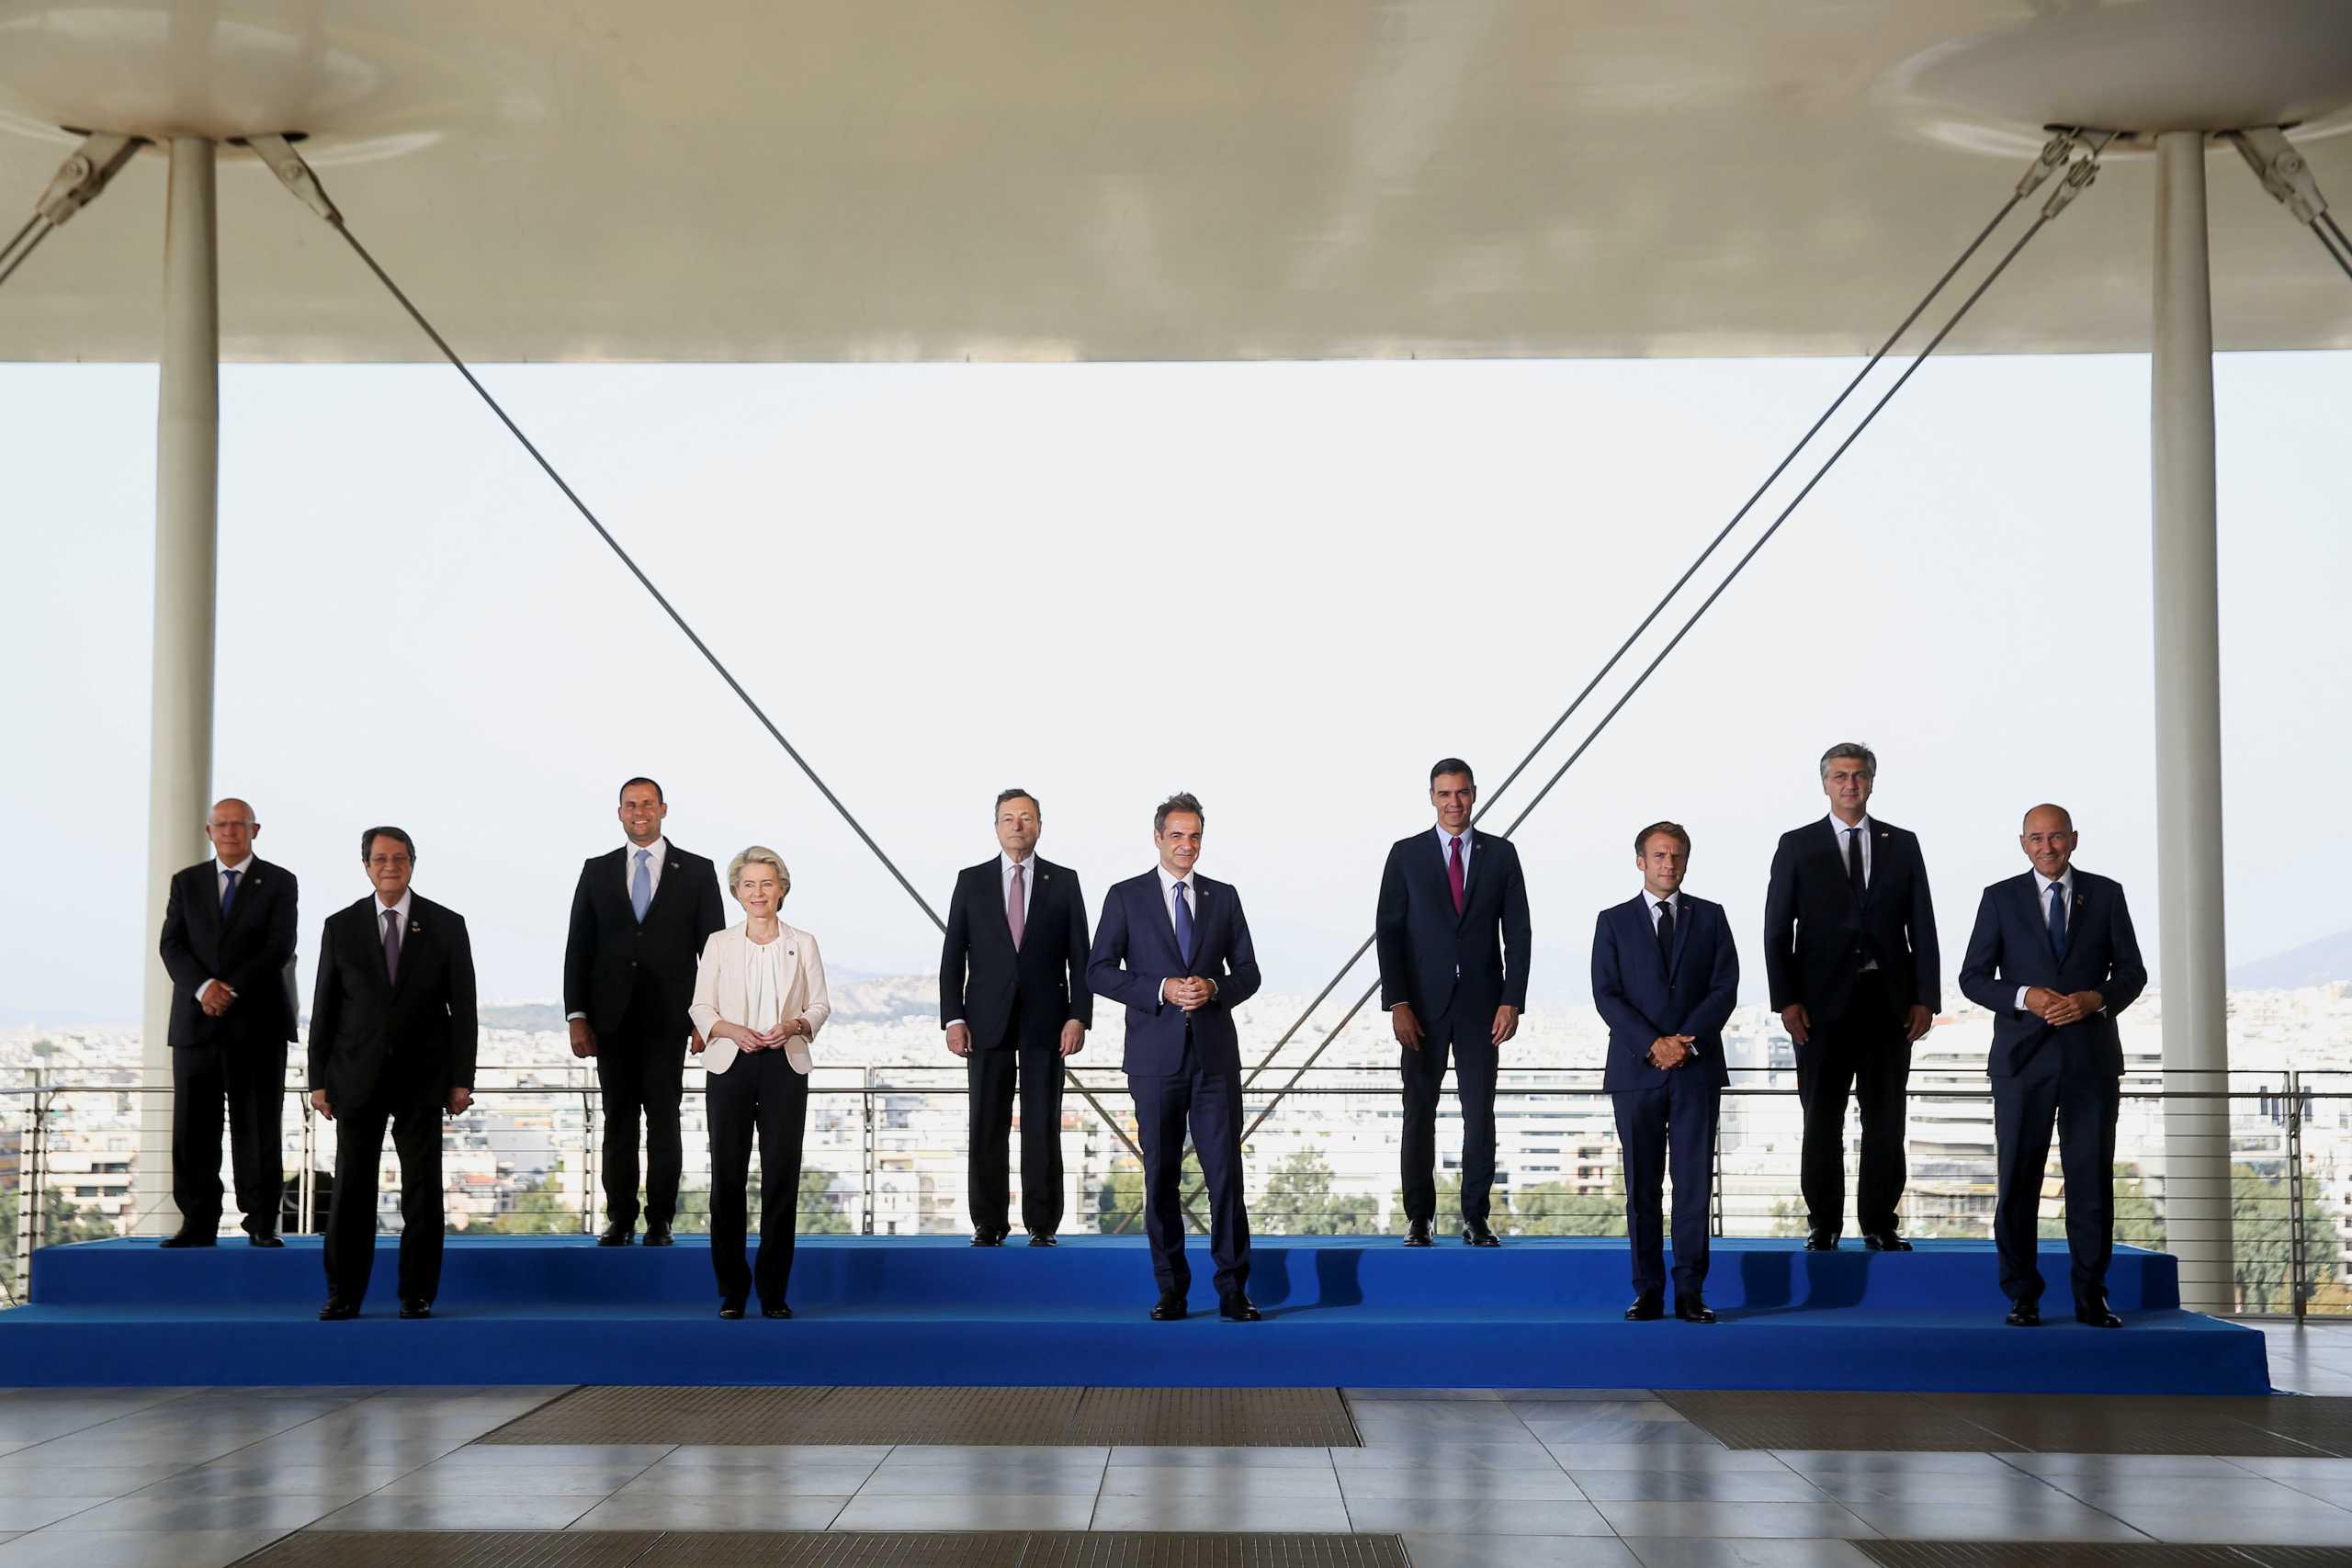 Eumed 9: H Διακήρυξη της Αθήνας για την Κλιματική αλλαγή και το περιβάλλον στην Μεσόγειο